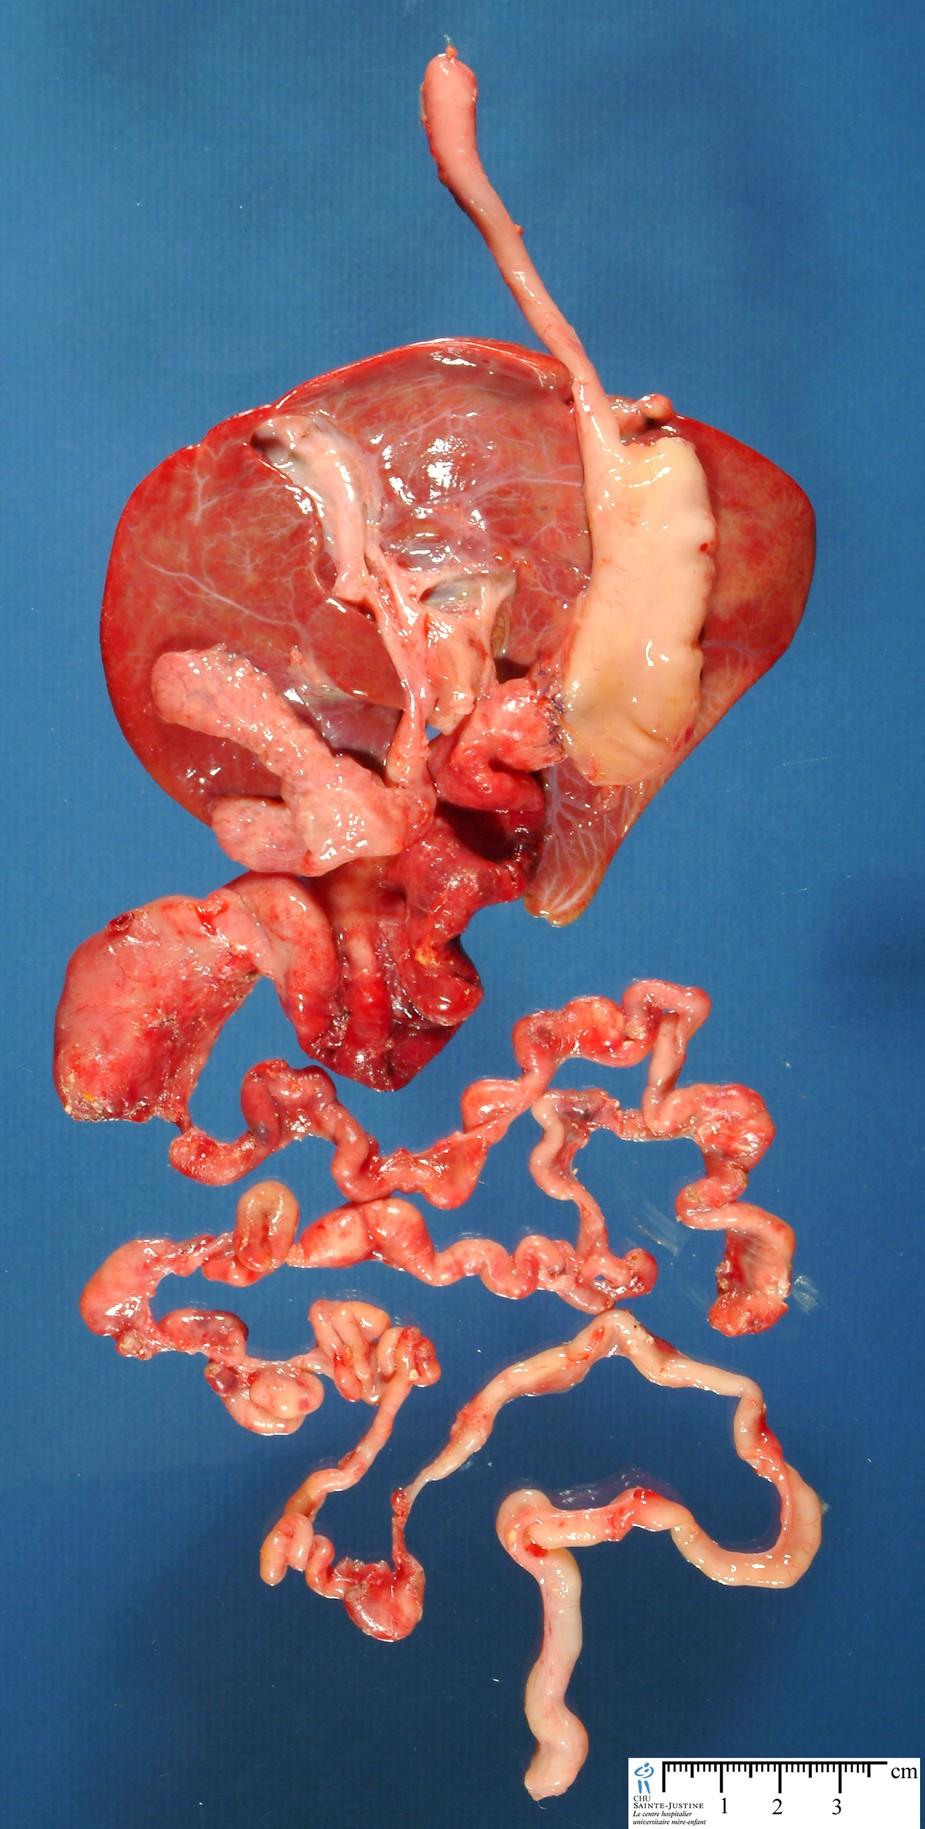 Jpg Multiple Intestinal Atresia Syndrome Ab